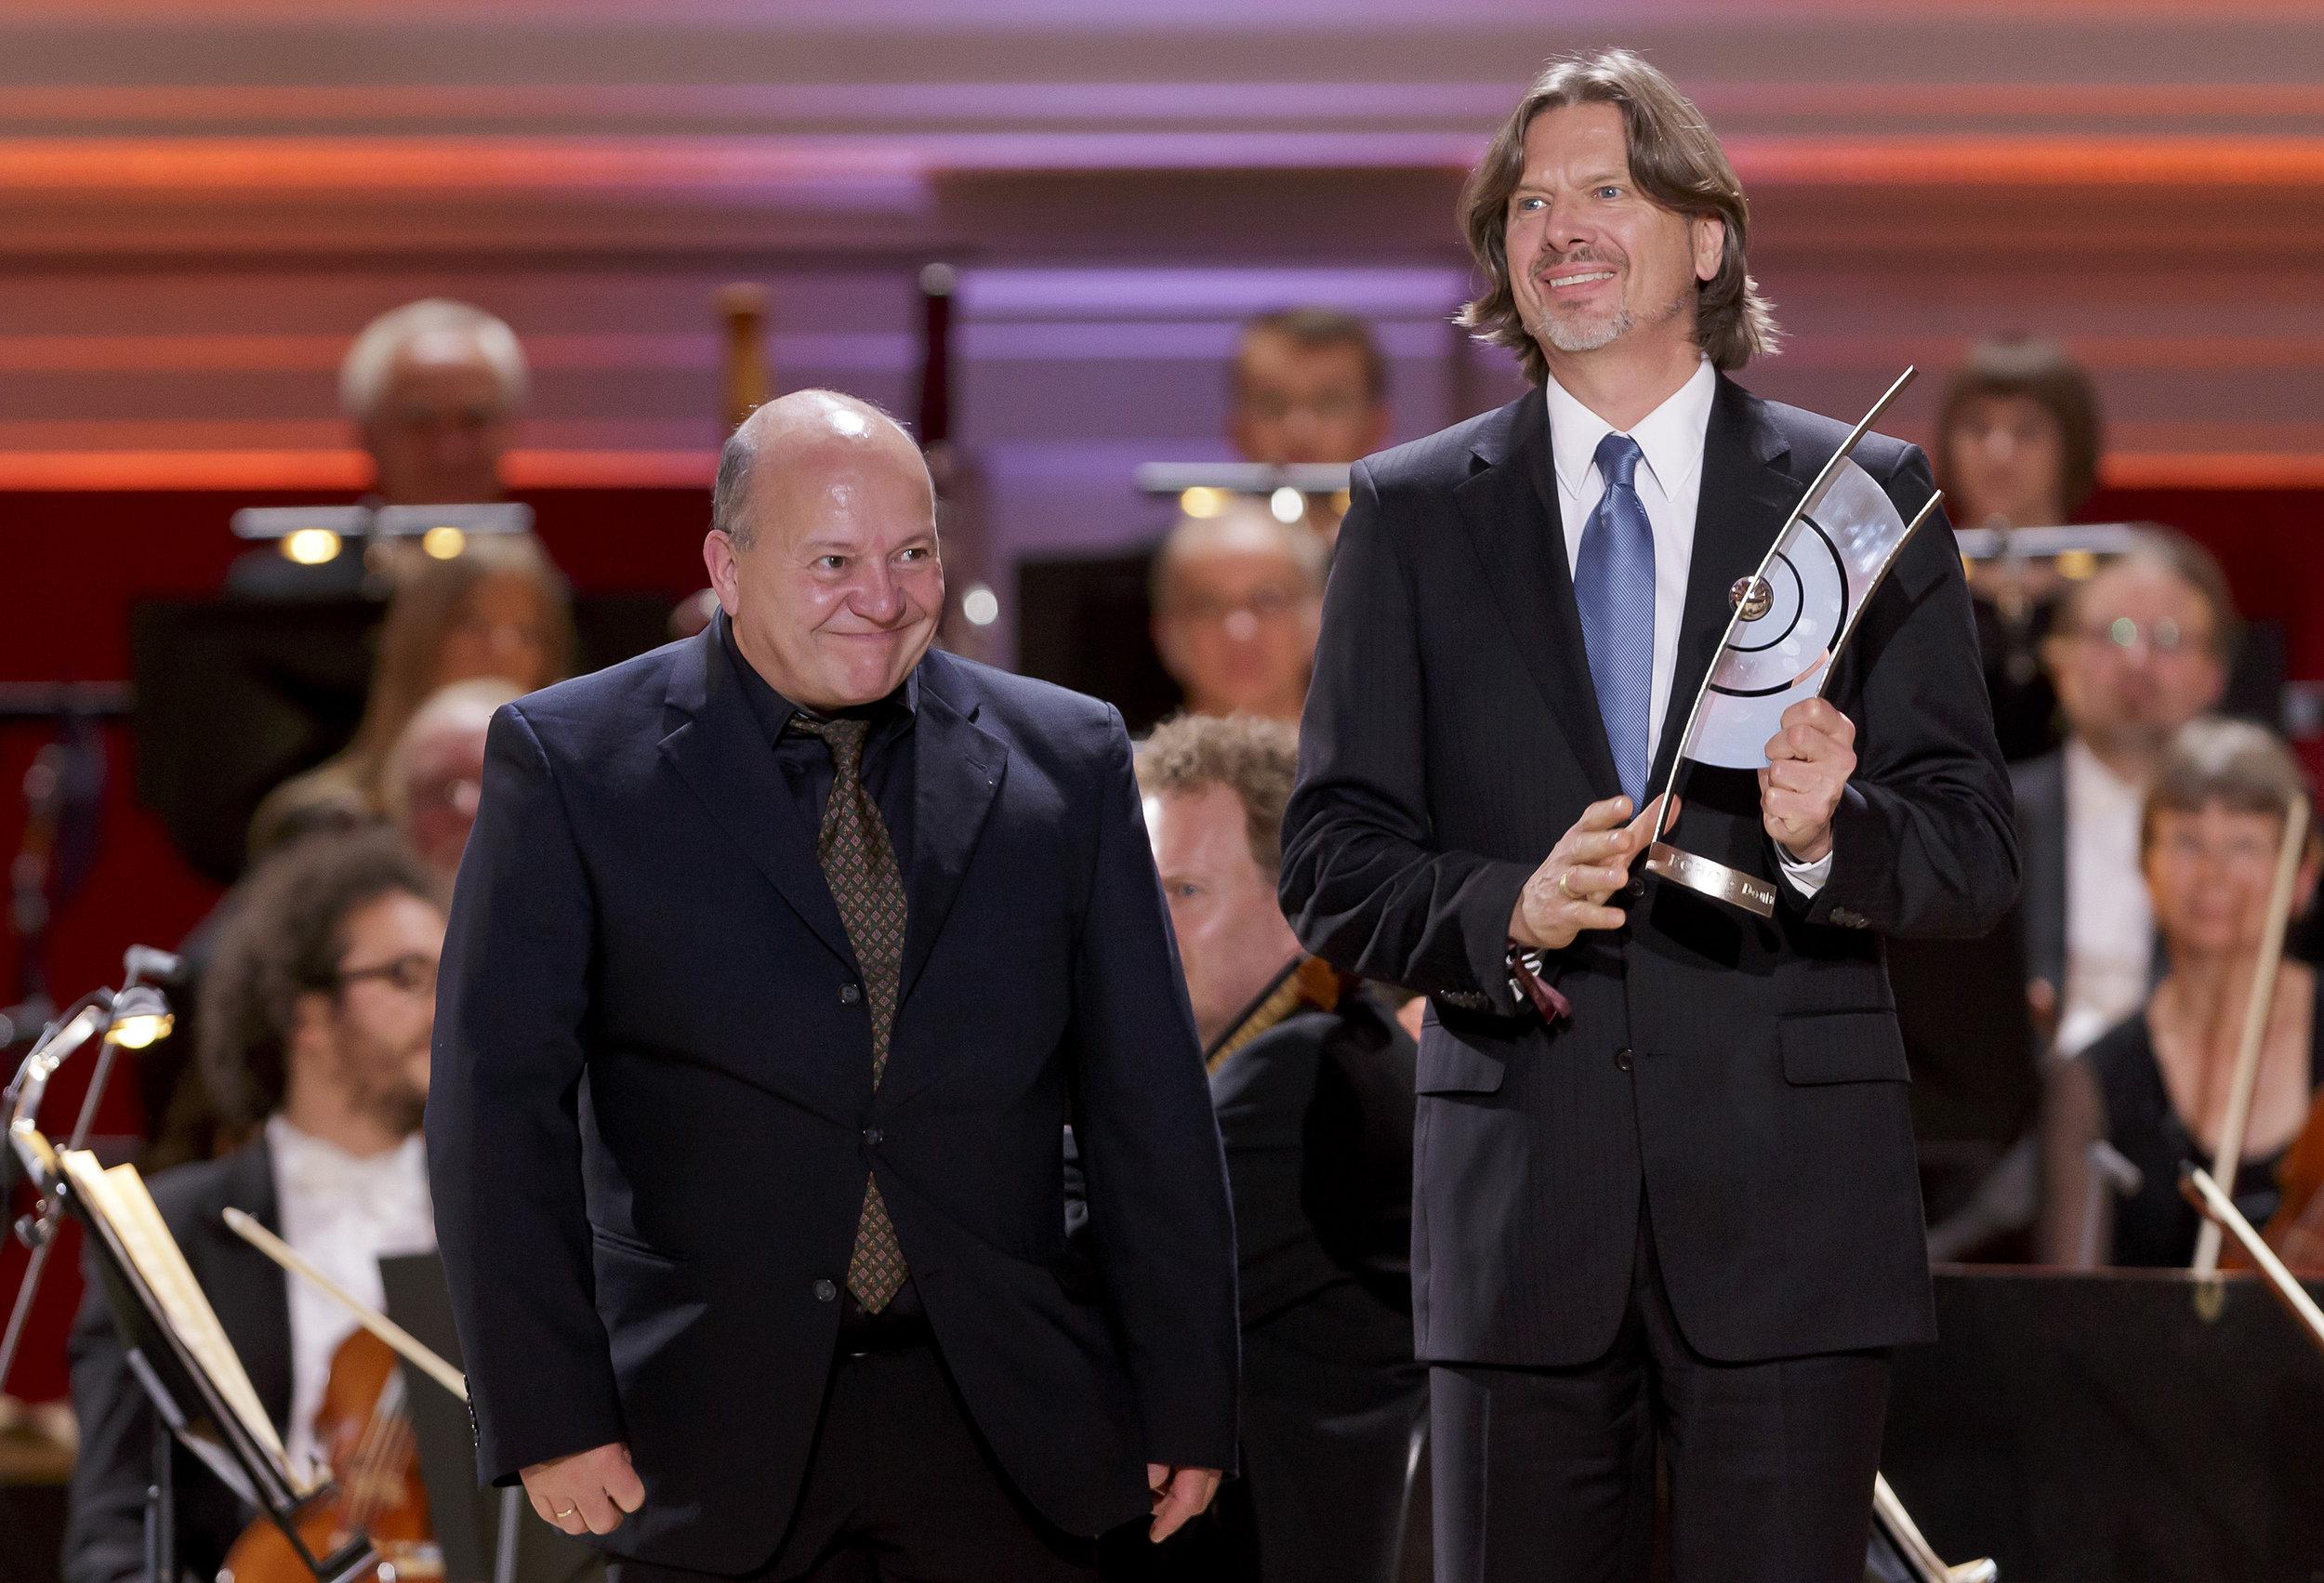 Timothy Leigh Evans and I receiving the Echo Prize in 2013 for Requiem for a Pink Moon (Klassik ohne Grenzen) Foto: Wüstenhagen